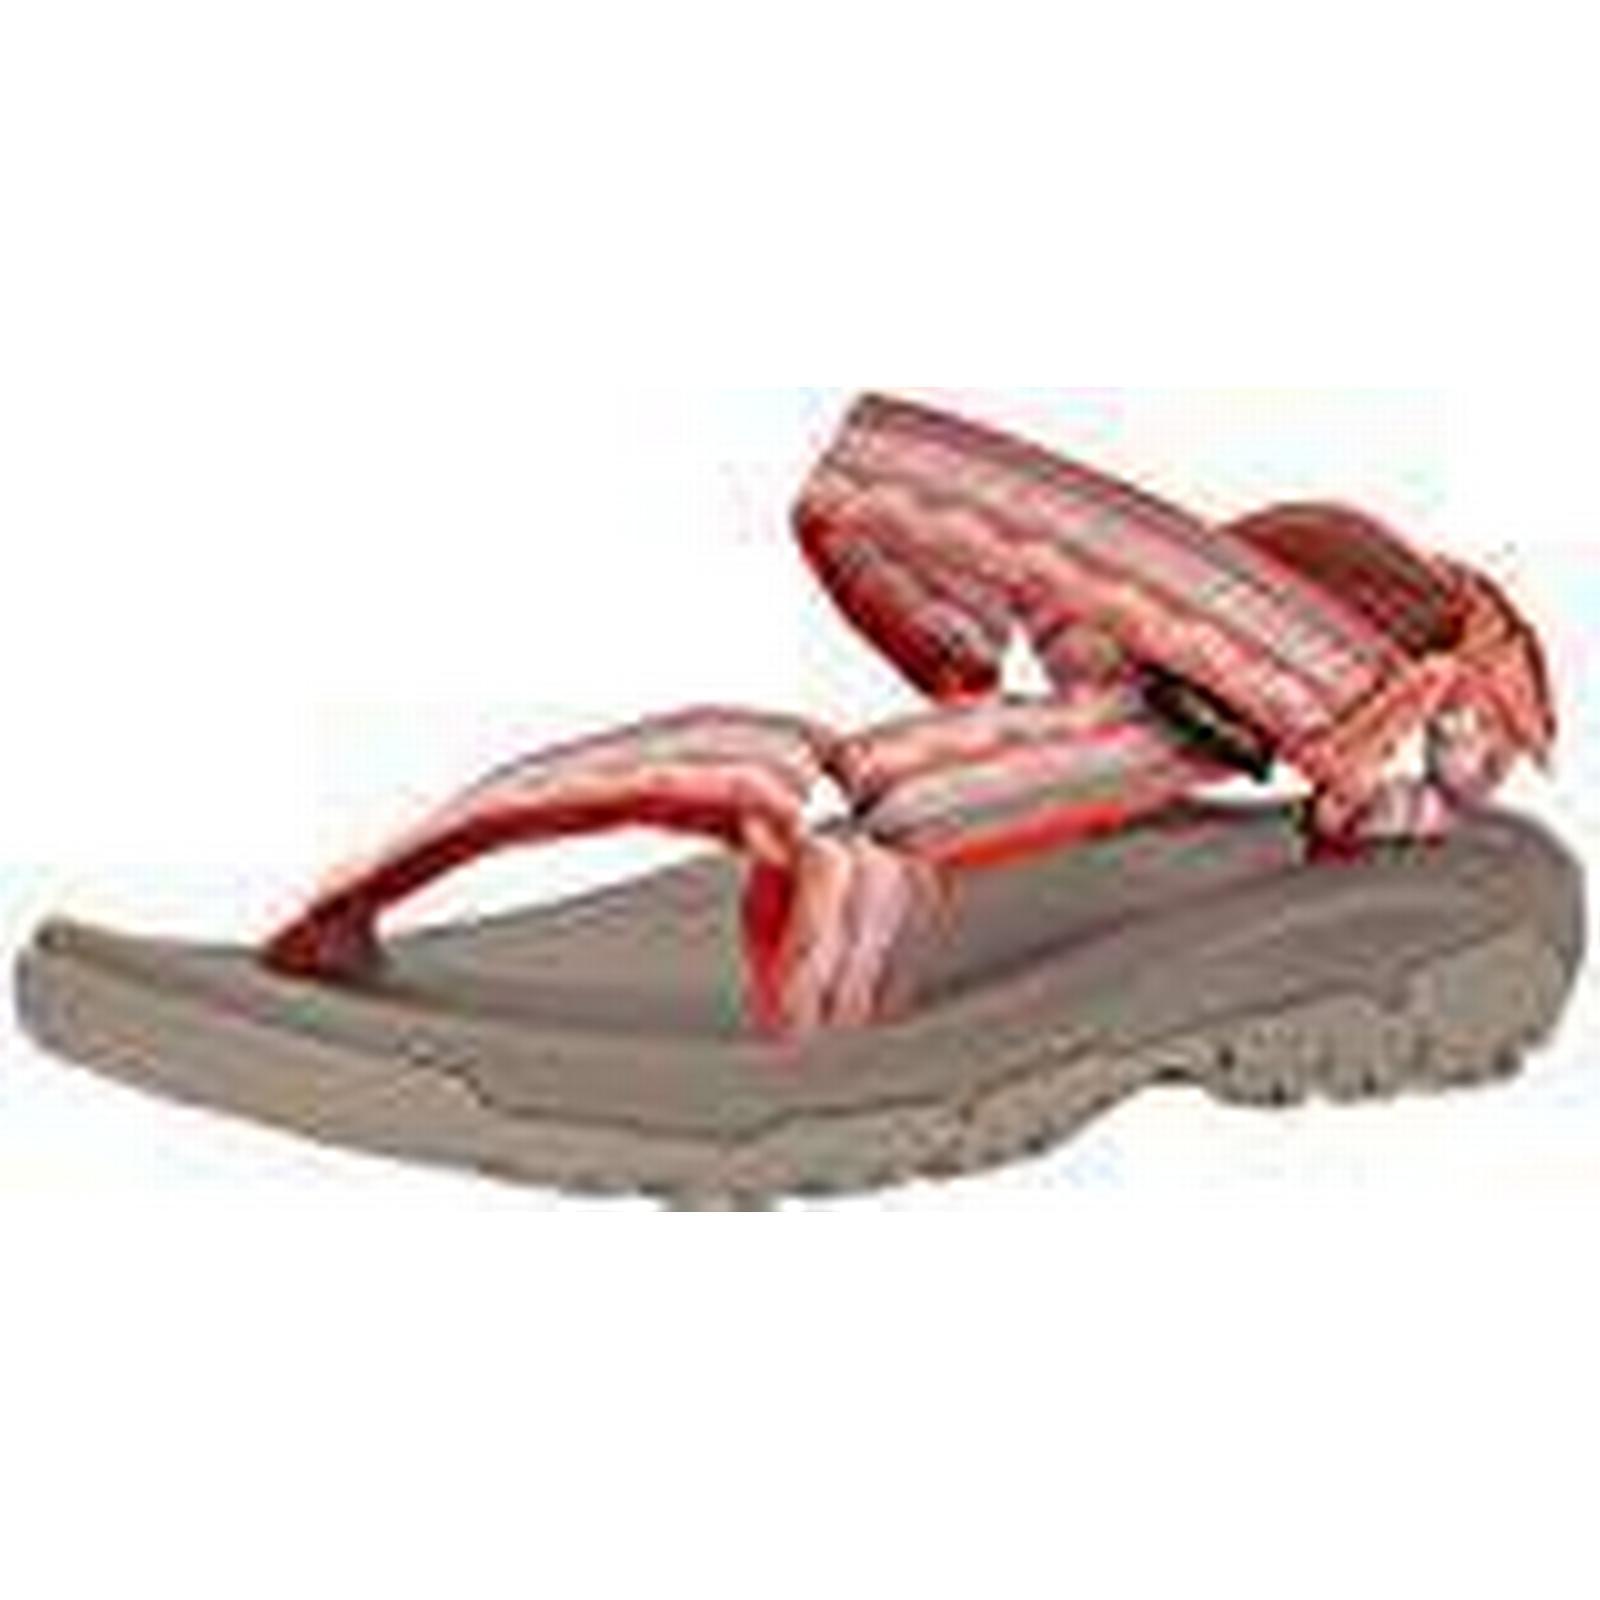 Teva Women's Hurricane XLT 2 Sports and Outdoor Lifestyle Sandal, UK Orange (Lago Coral), 3 UK Sandal, (36 EU) dffc22